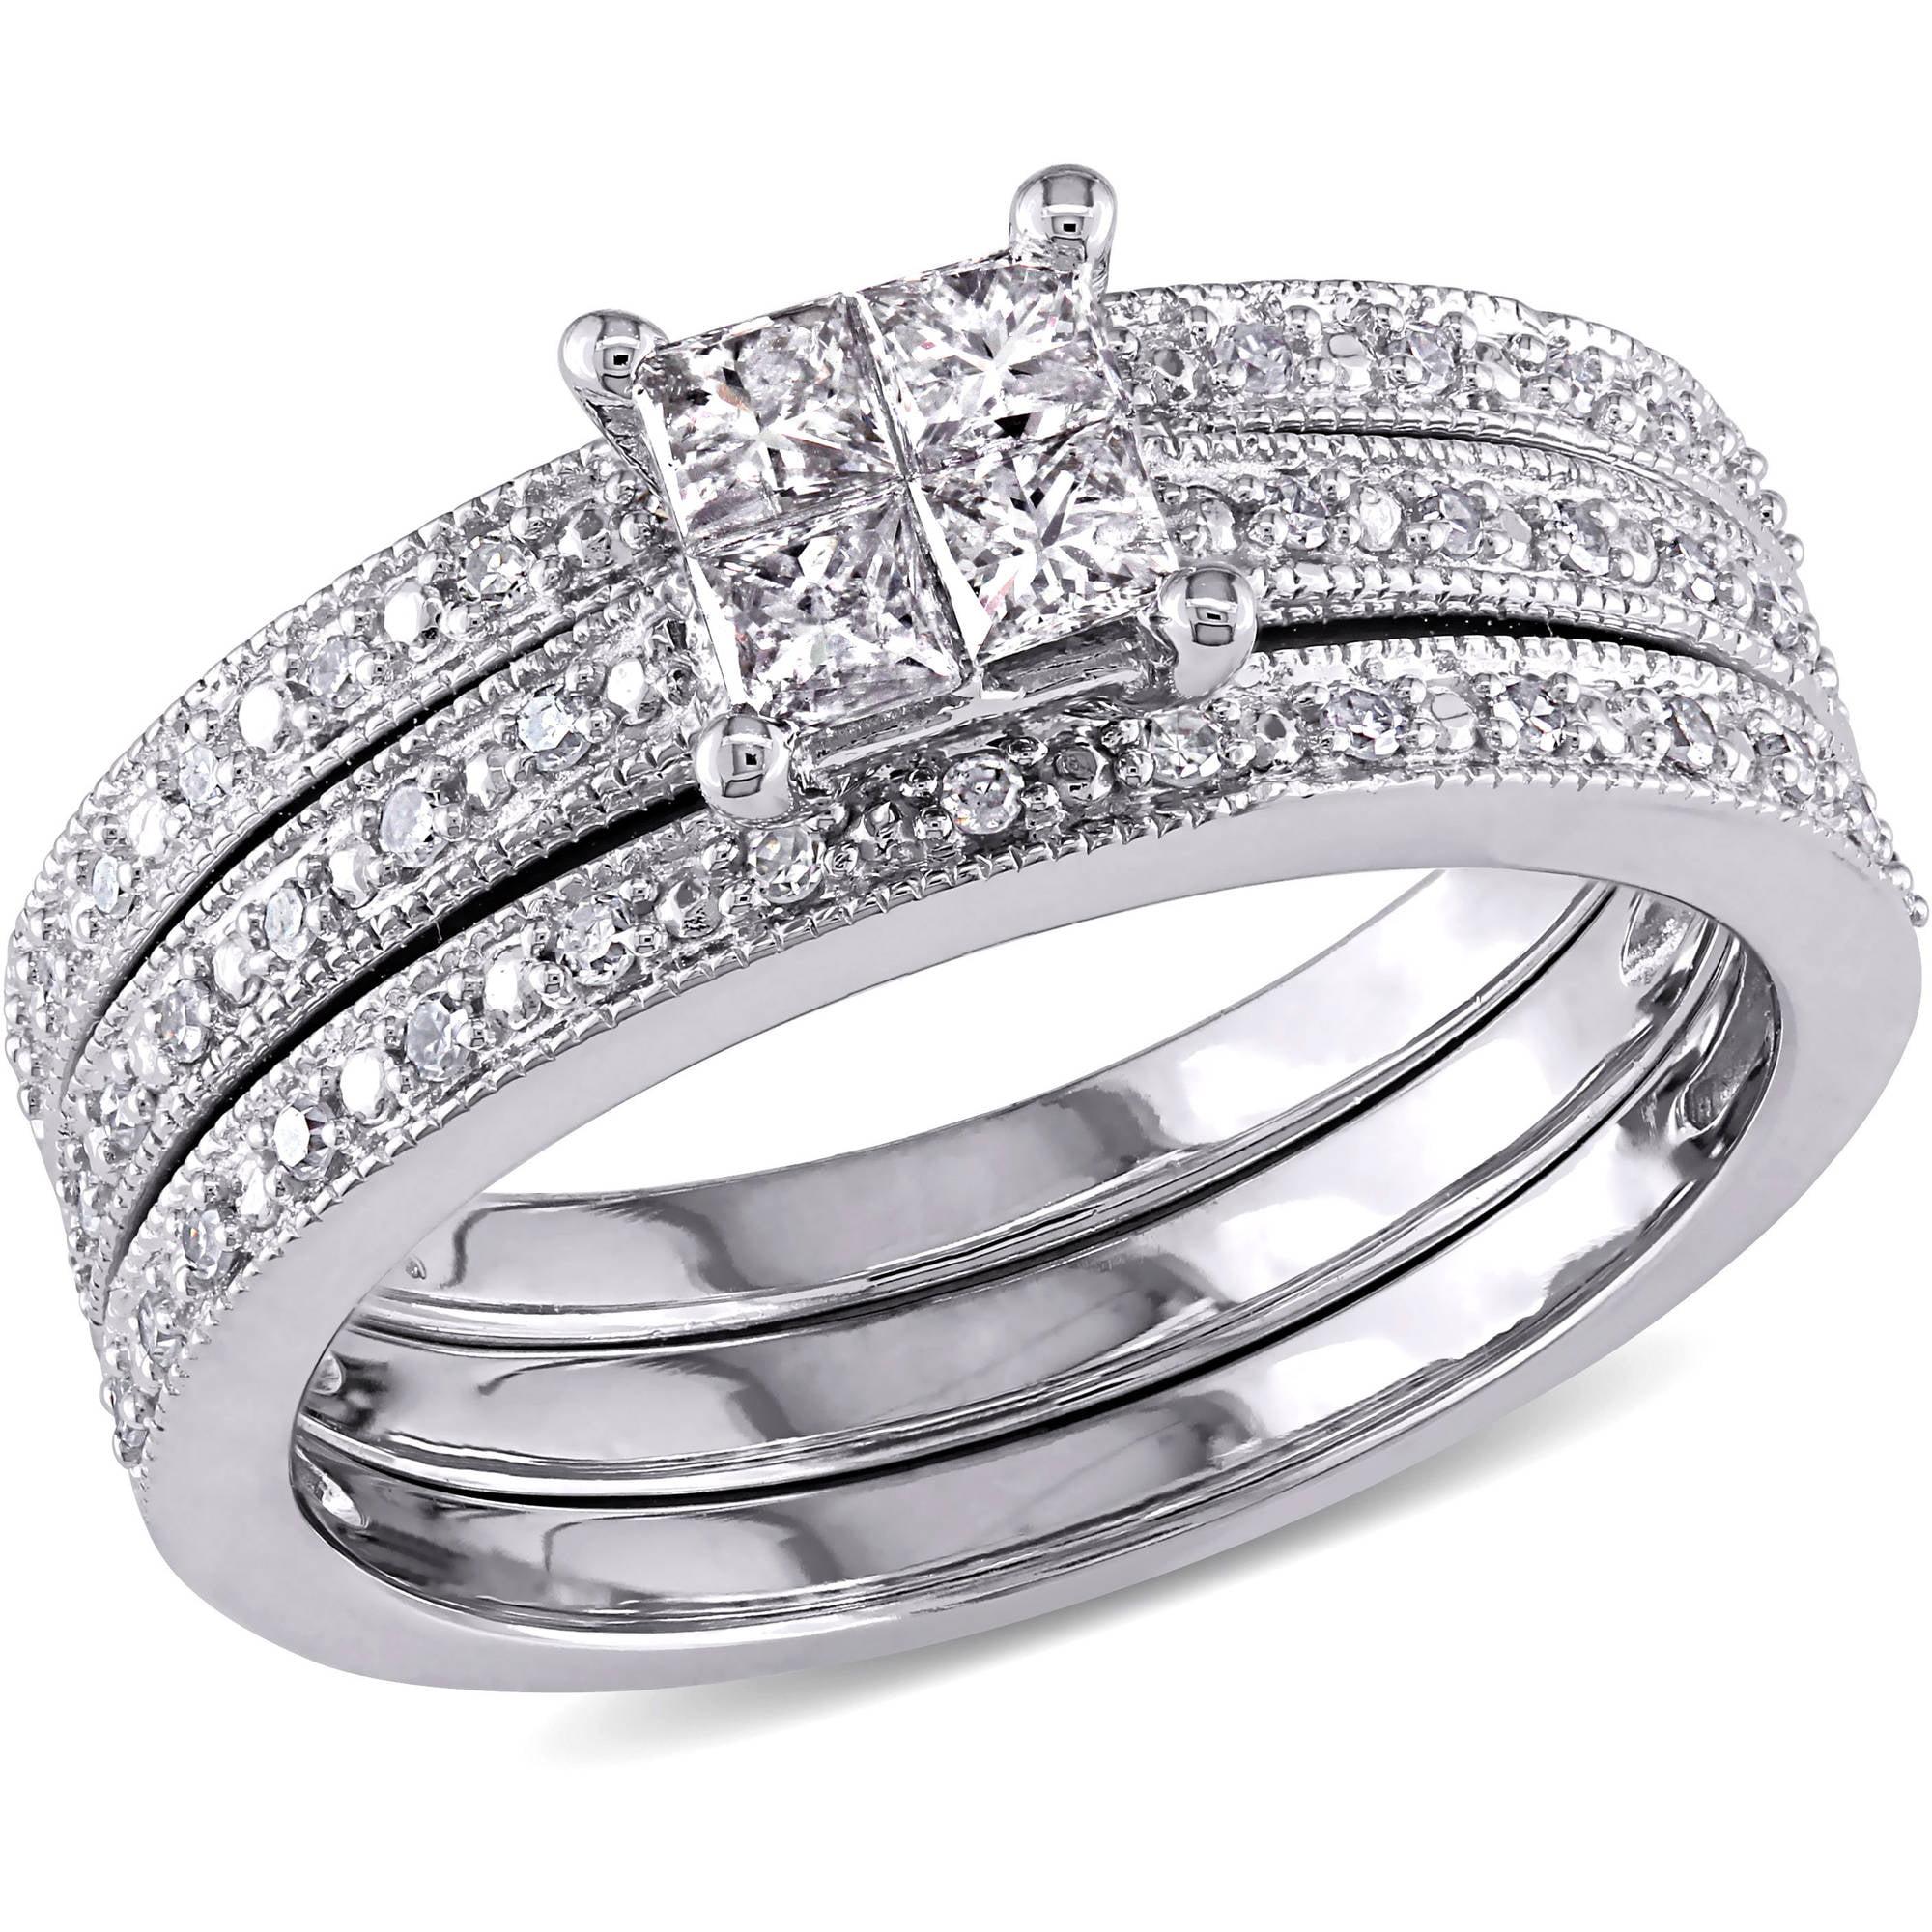 Miabella 3 8 Carat T.W. Princess and Round-cut Diamond 10kt White Gold Bridal Set by Miabella